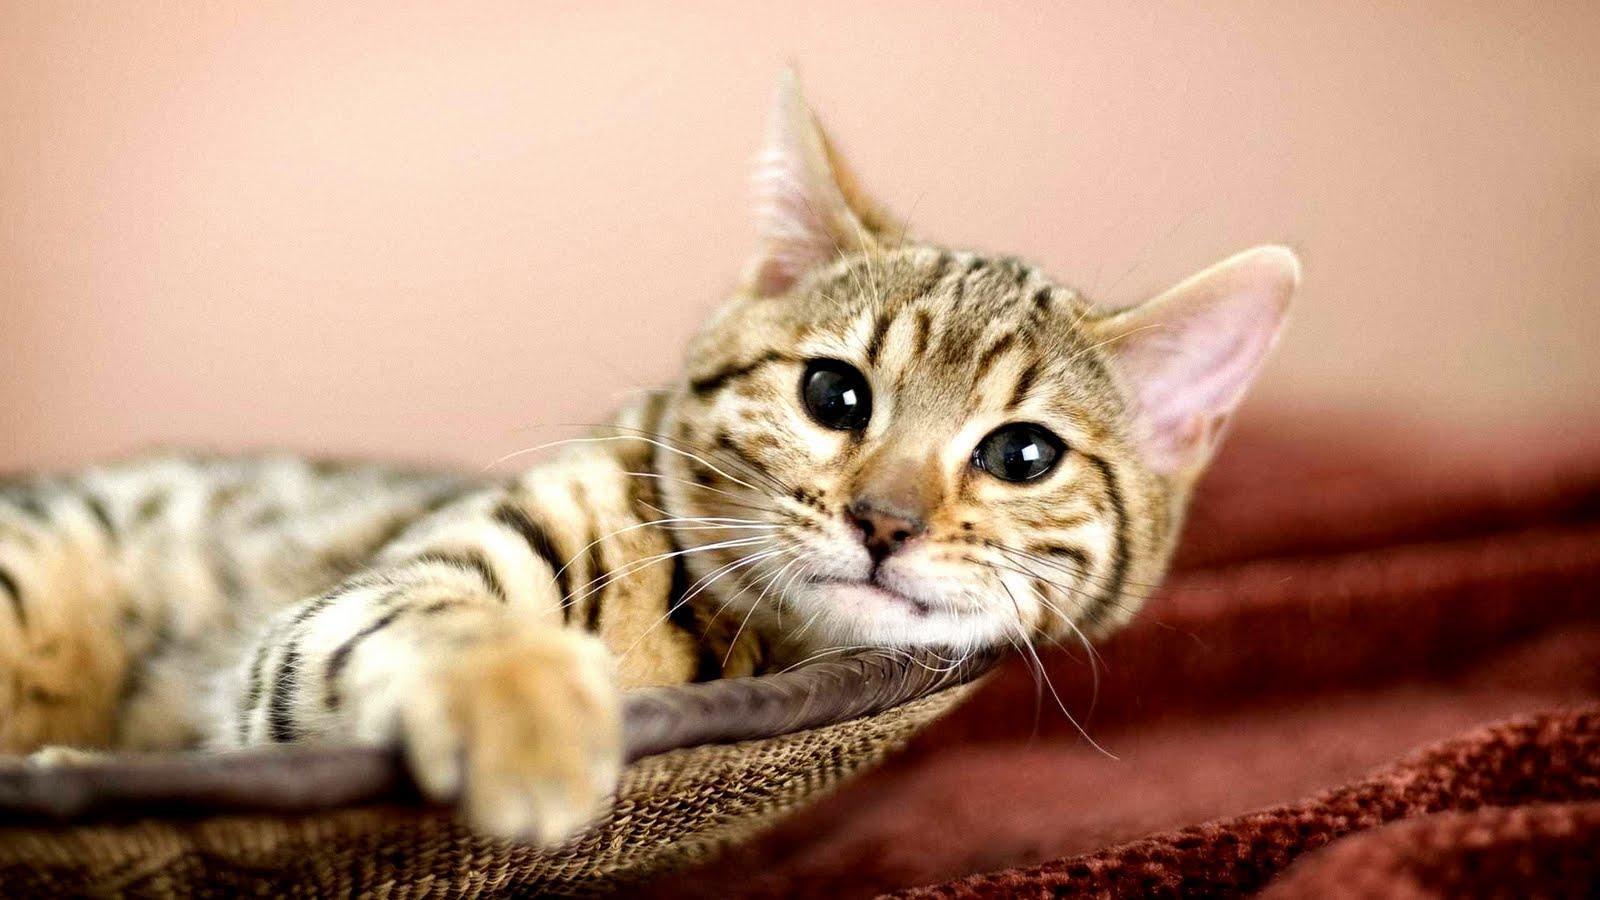 gatito-descansando-lazy-cat-gato-flojo-kitten